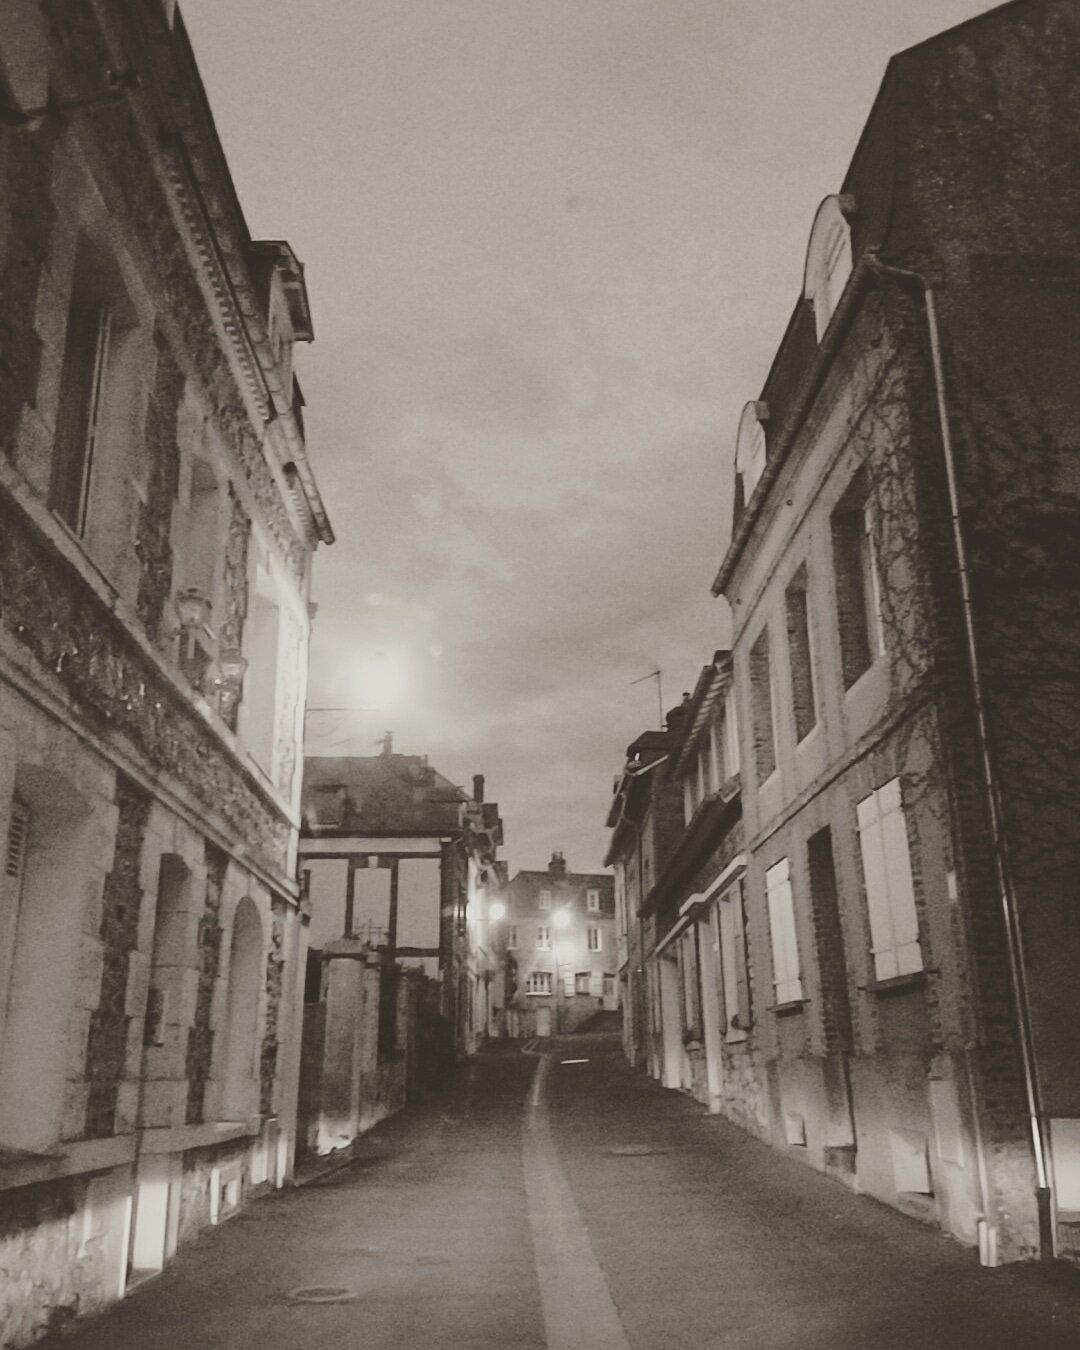 Rue peuplée - Maëliss VAN-DAMME